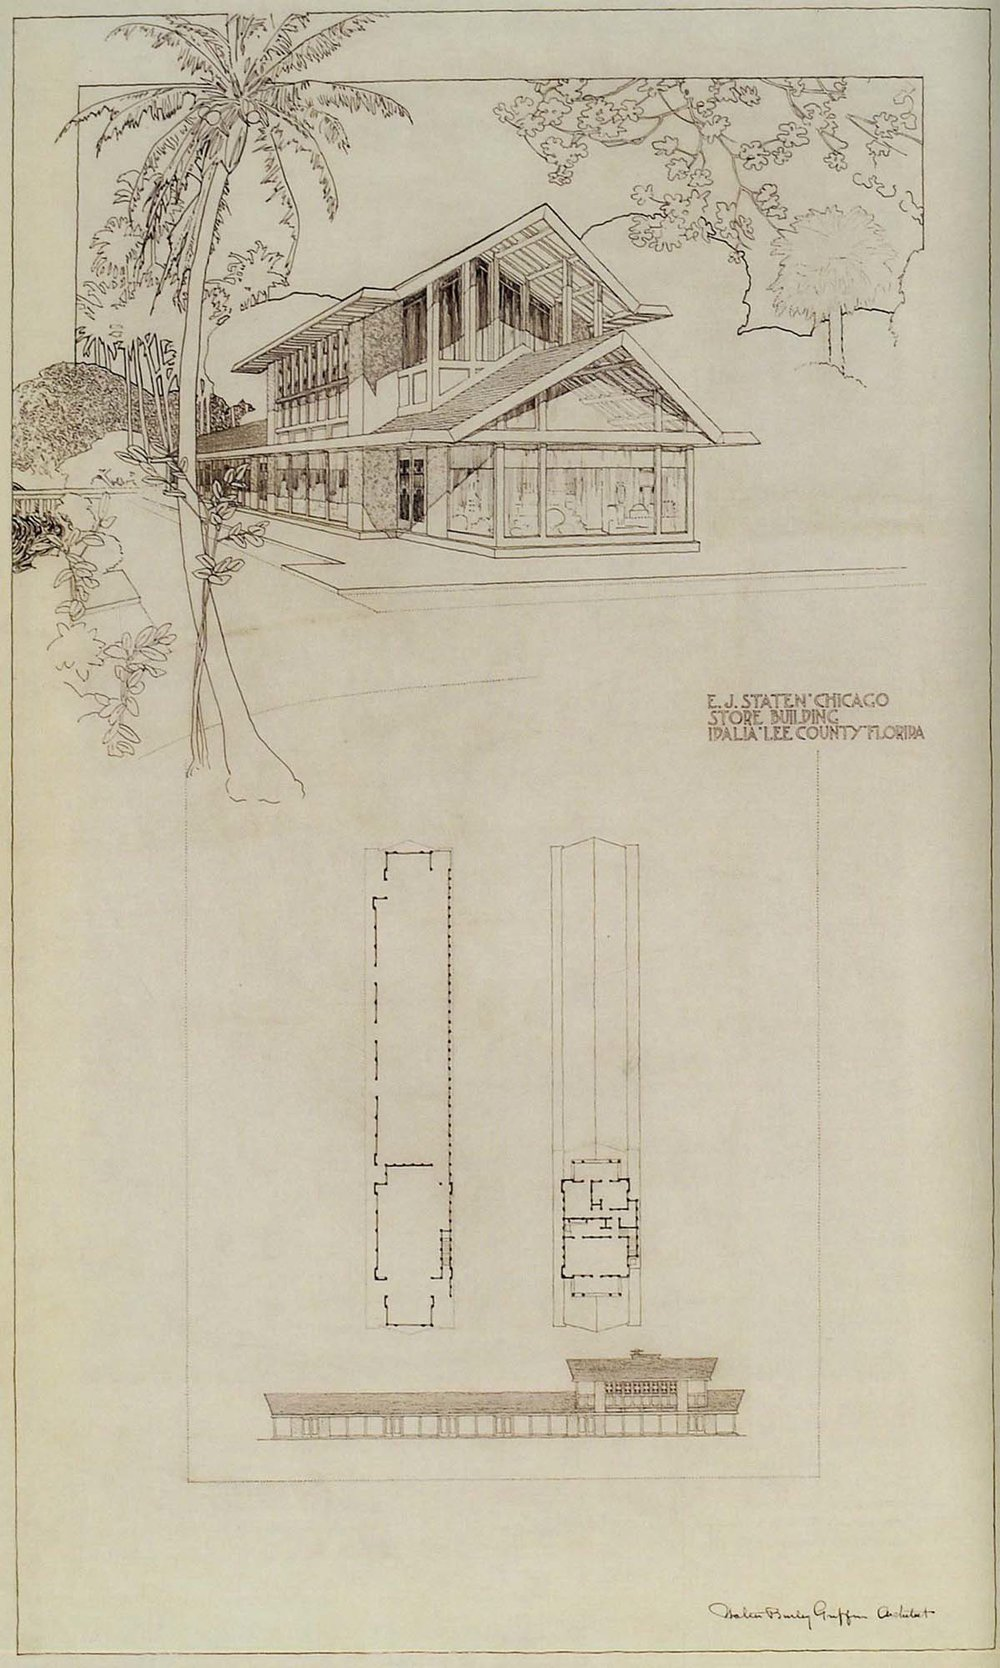 Staten Store, Idalia FL, W.B. Griffin Architect, 1911